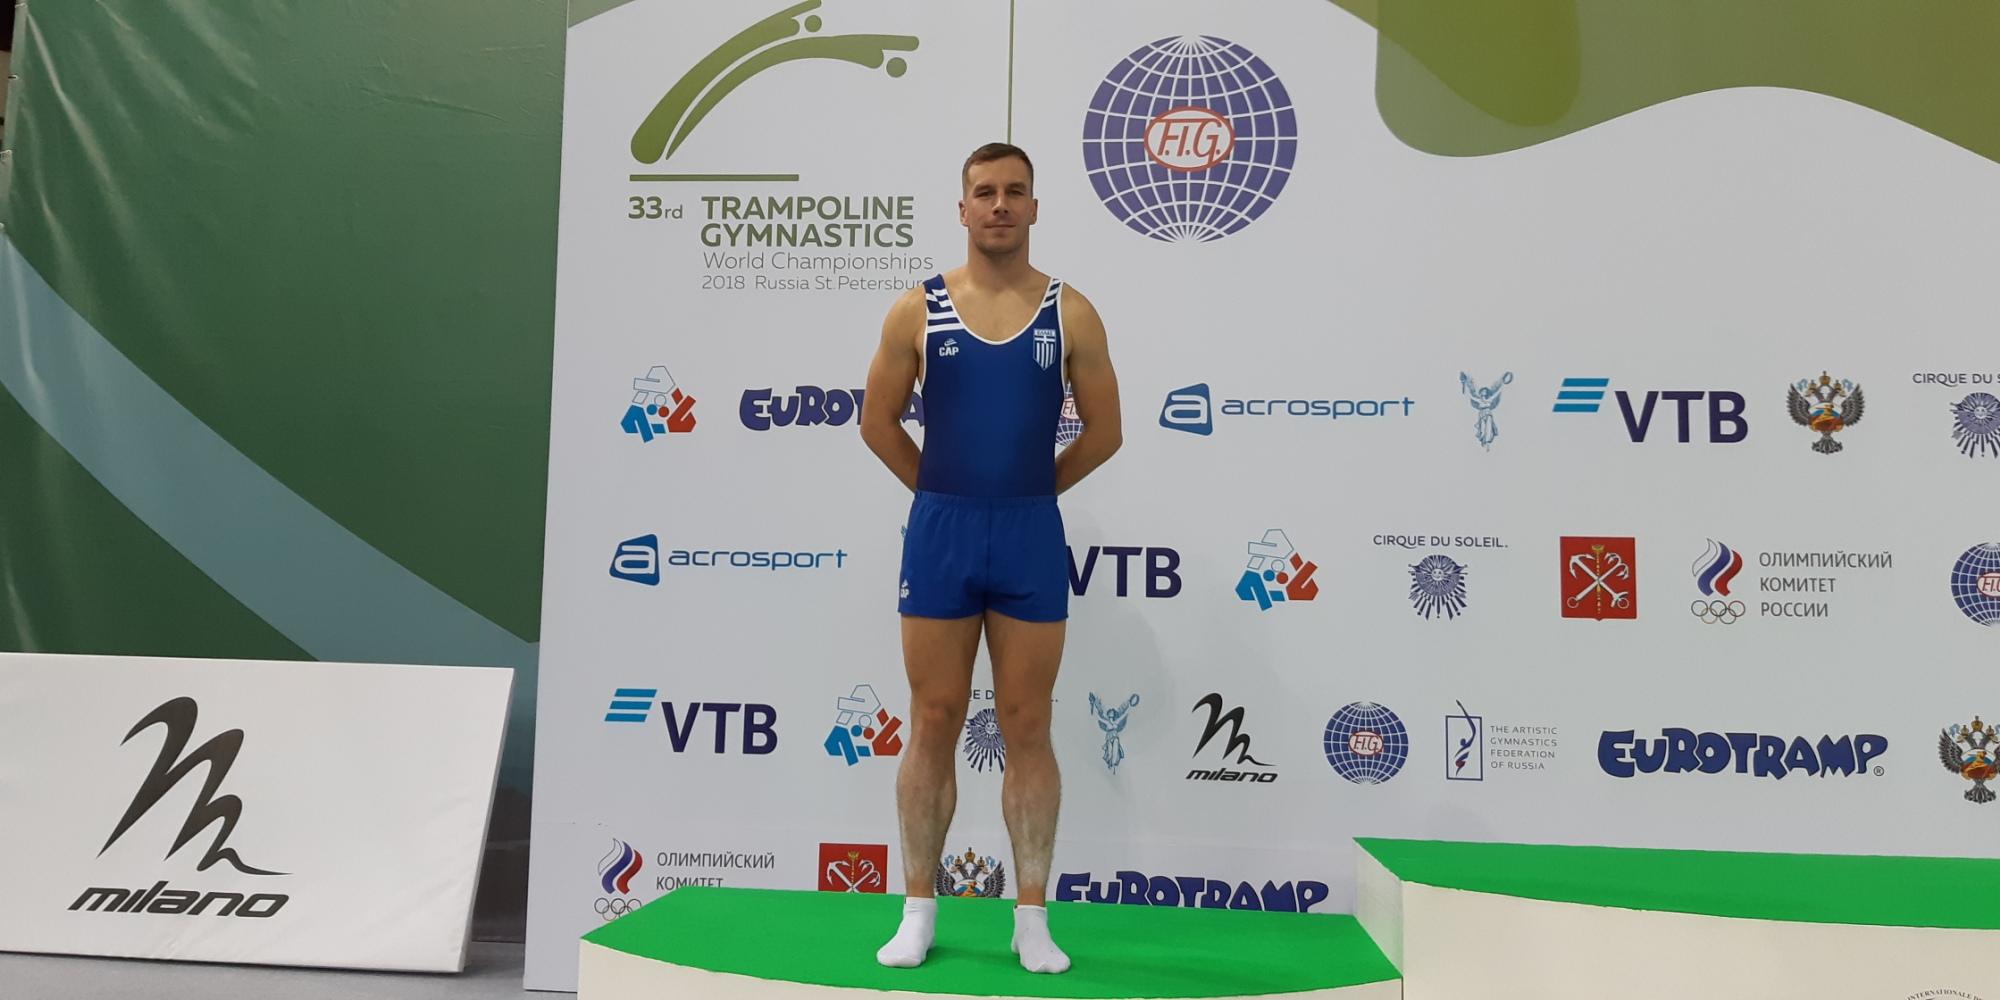 trampolino_st-petersburg2018_06_toptidis